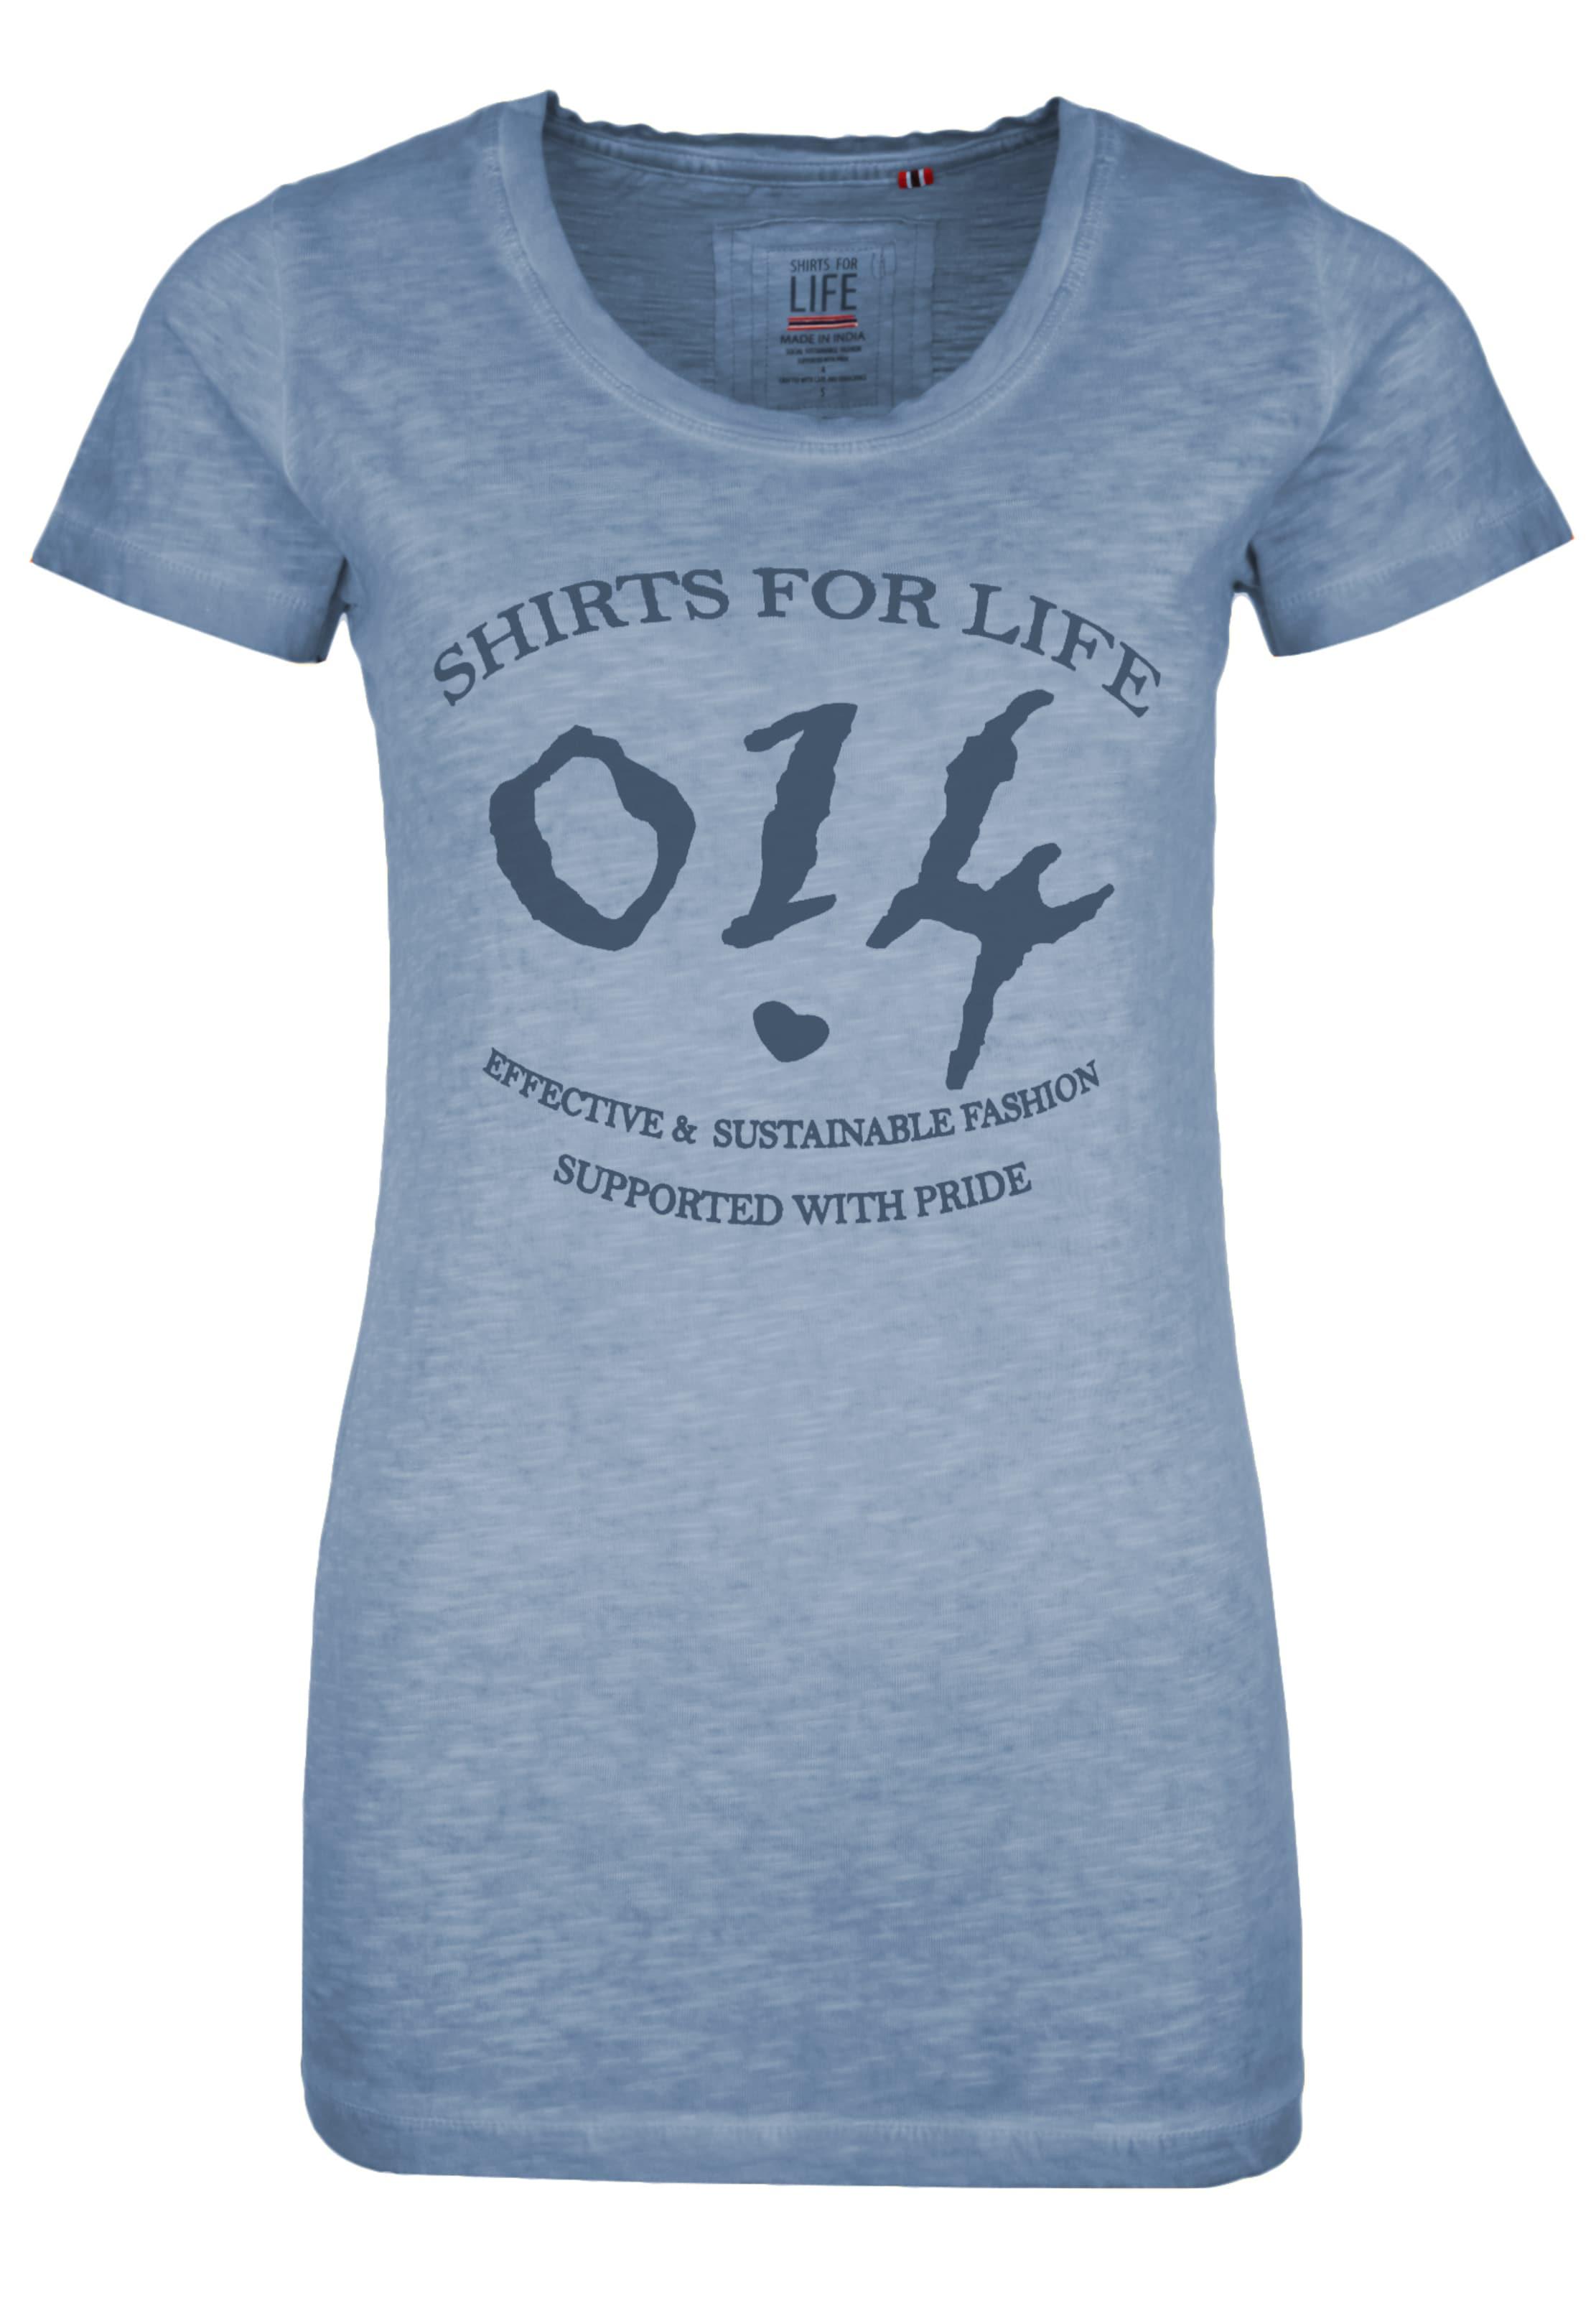 Rauchblau shirt In Life For Shirts T 'mara' c35ALj4RqS